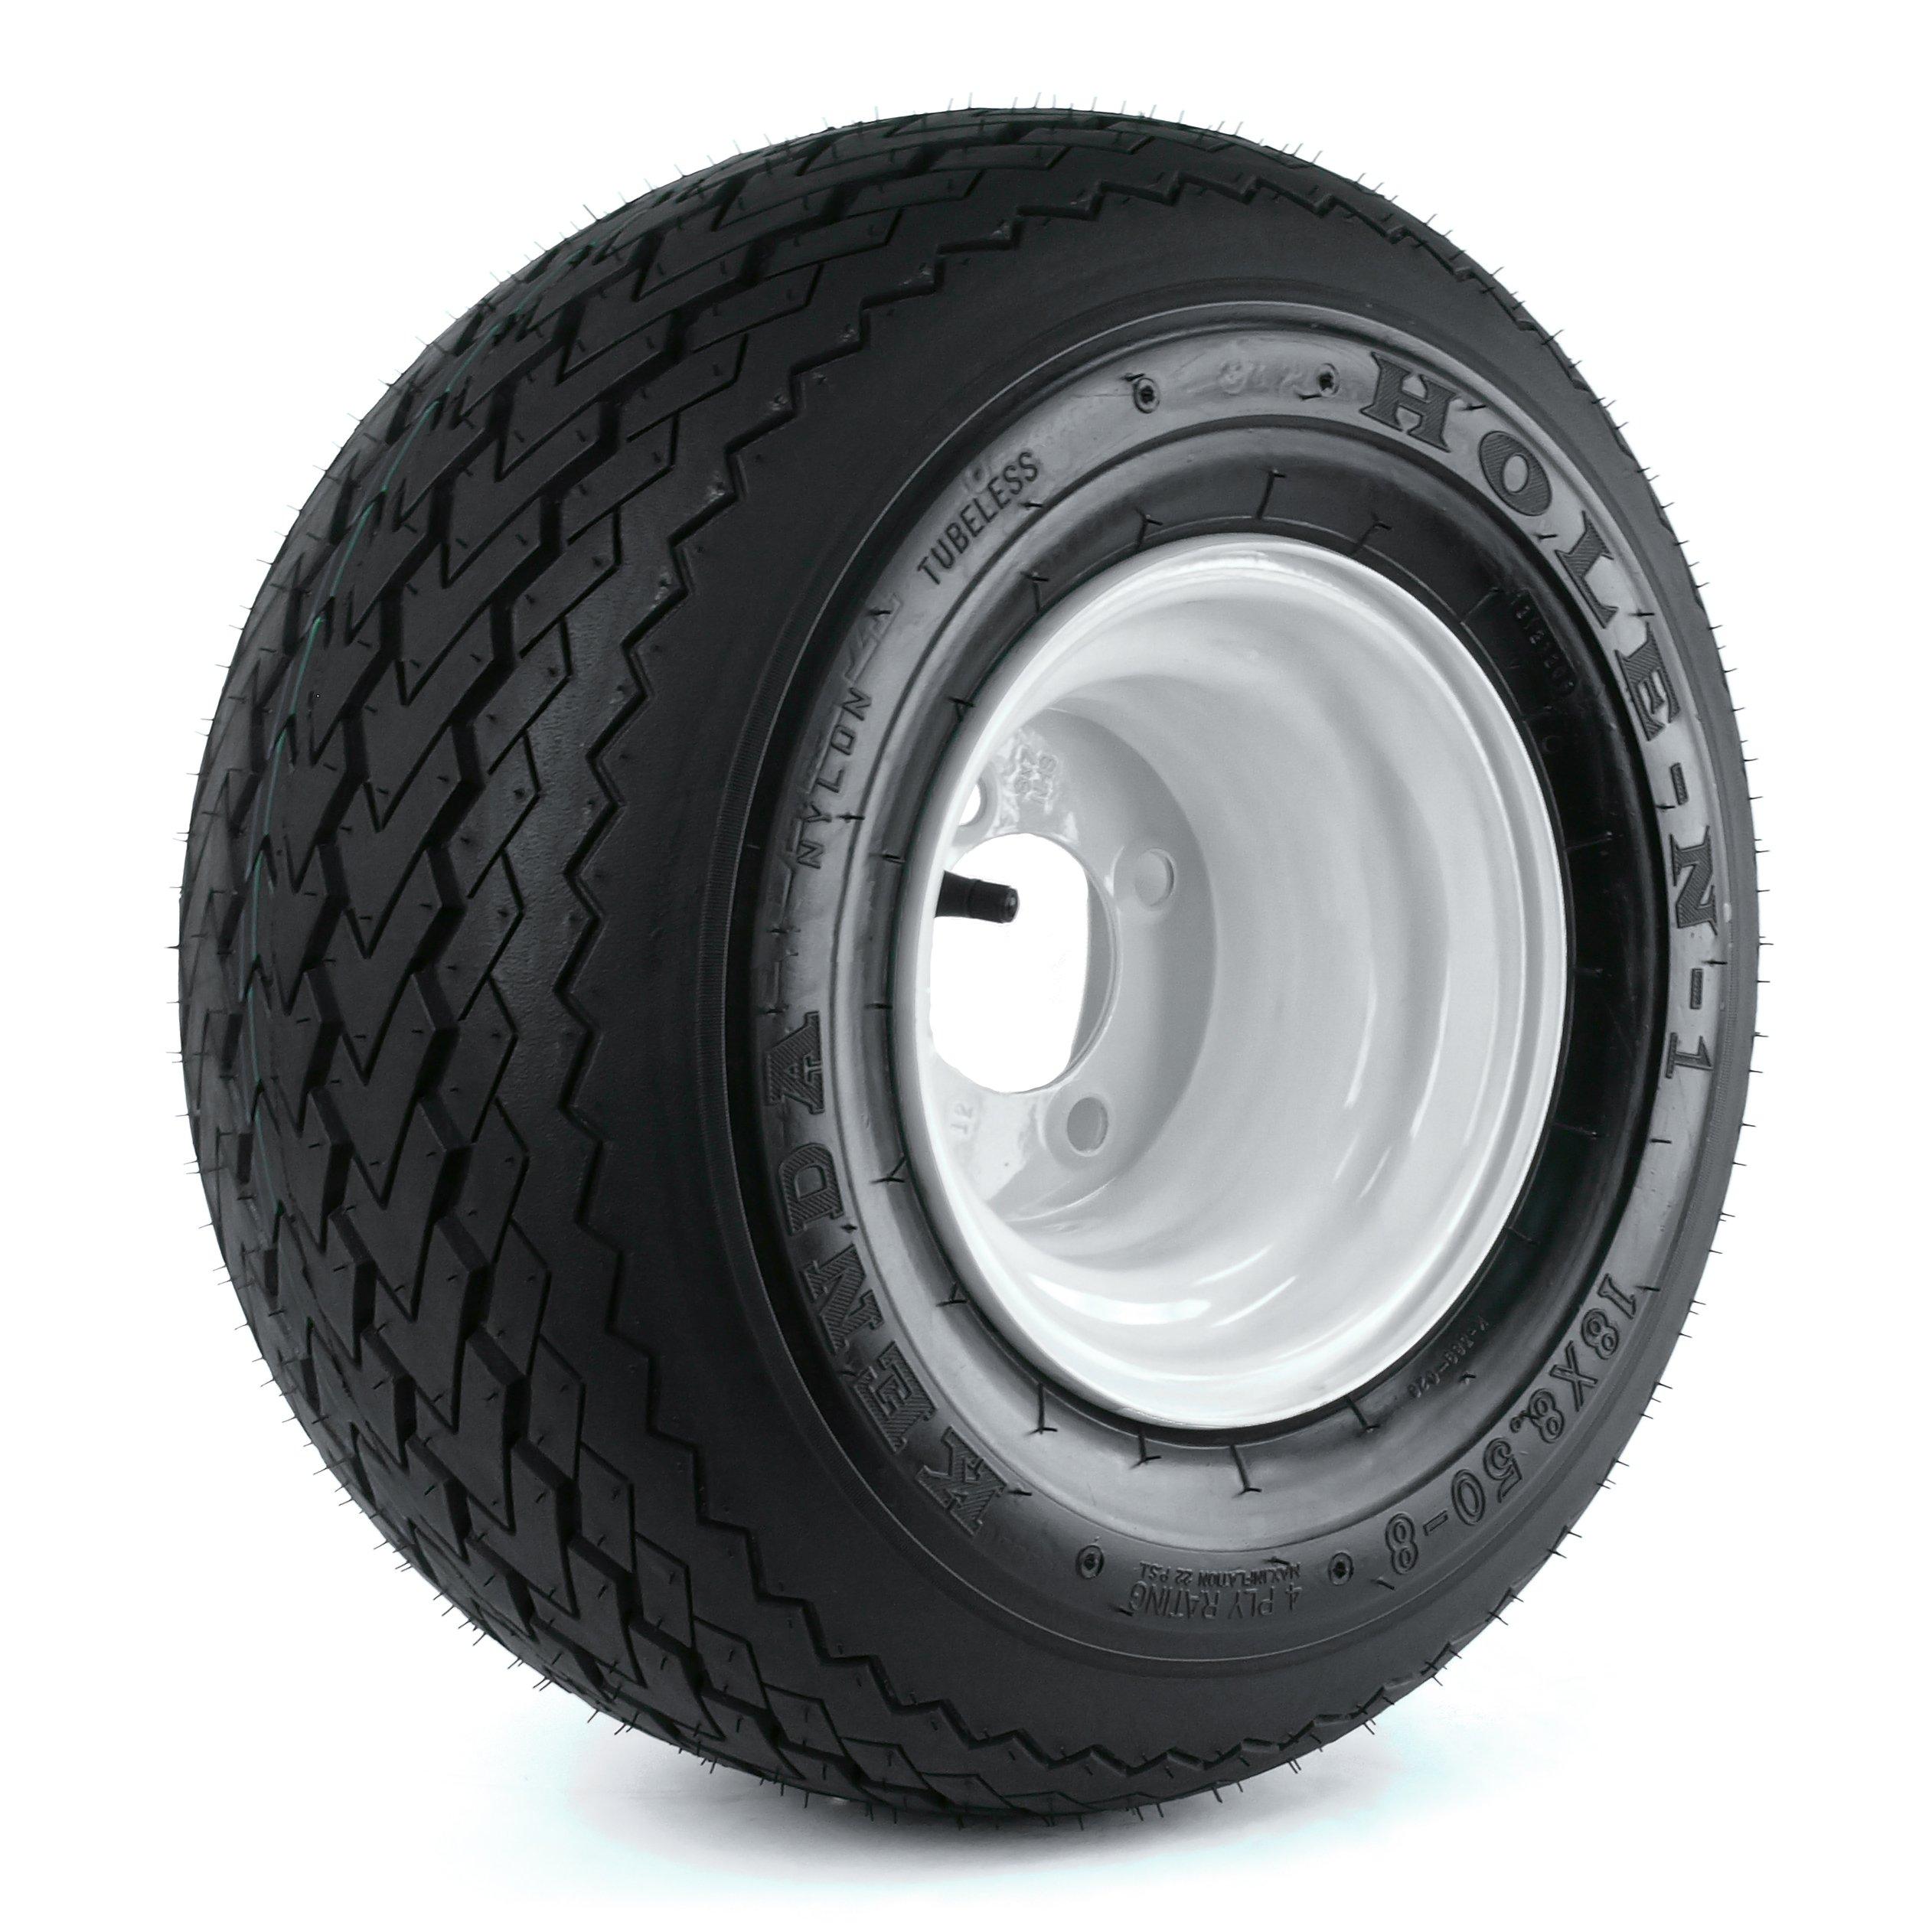 Kenda Hole-N-1 White 8'' x 7'' 4-Hole Wheel and (18/8.50-8) Tire Combination